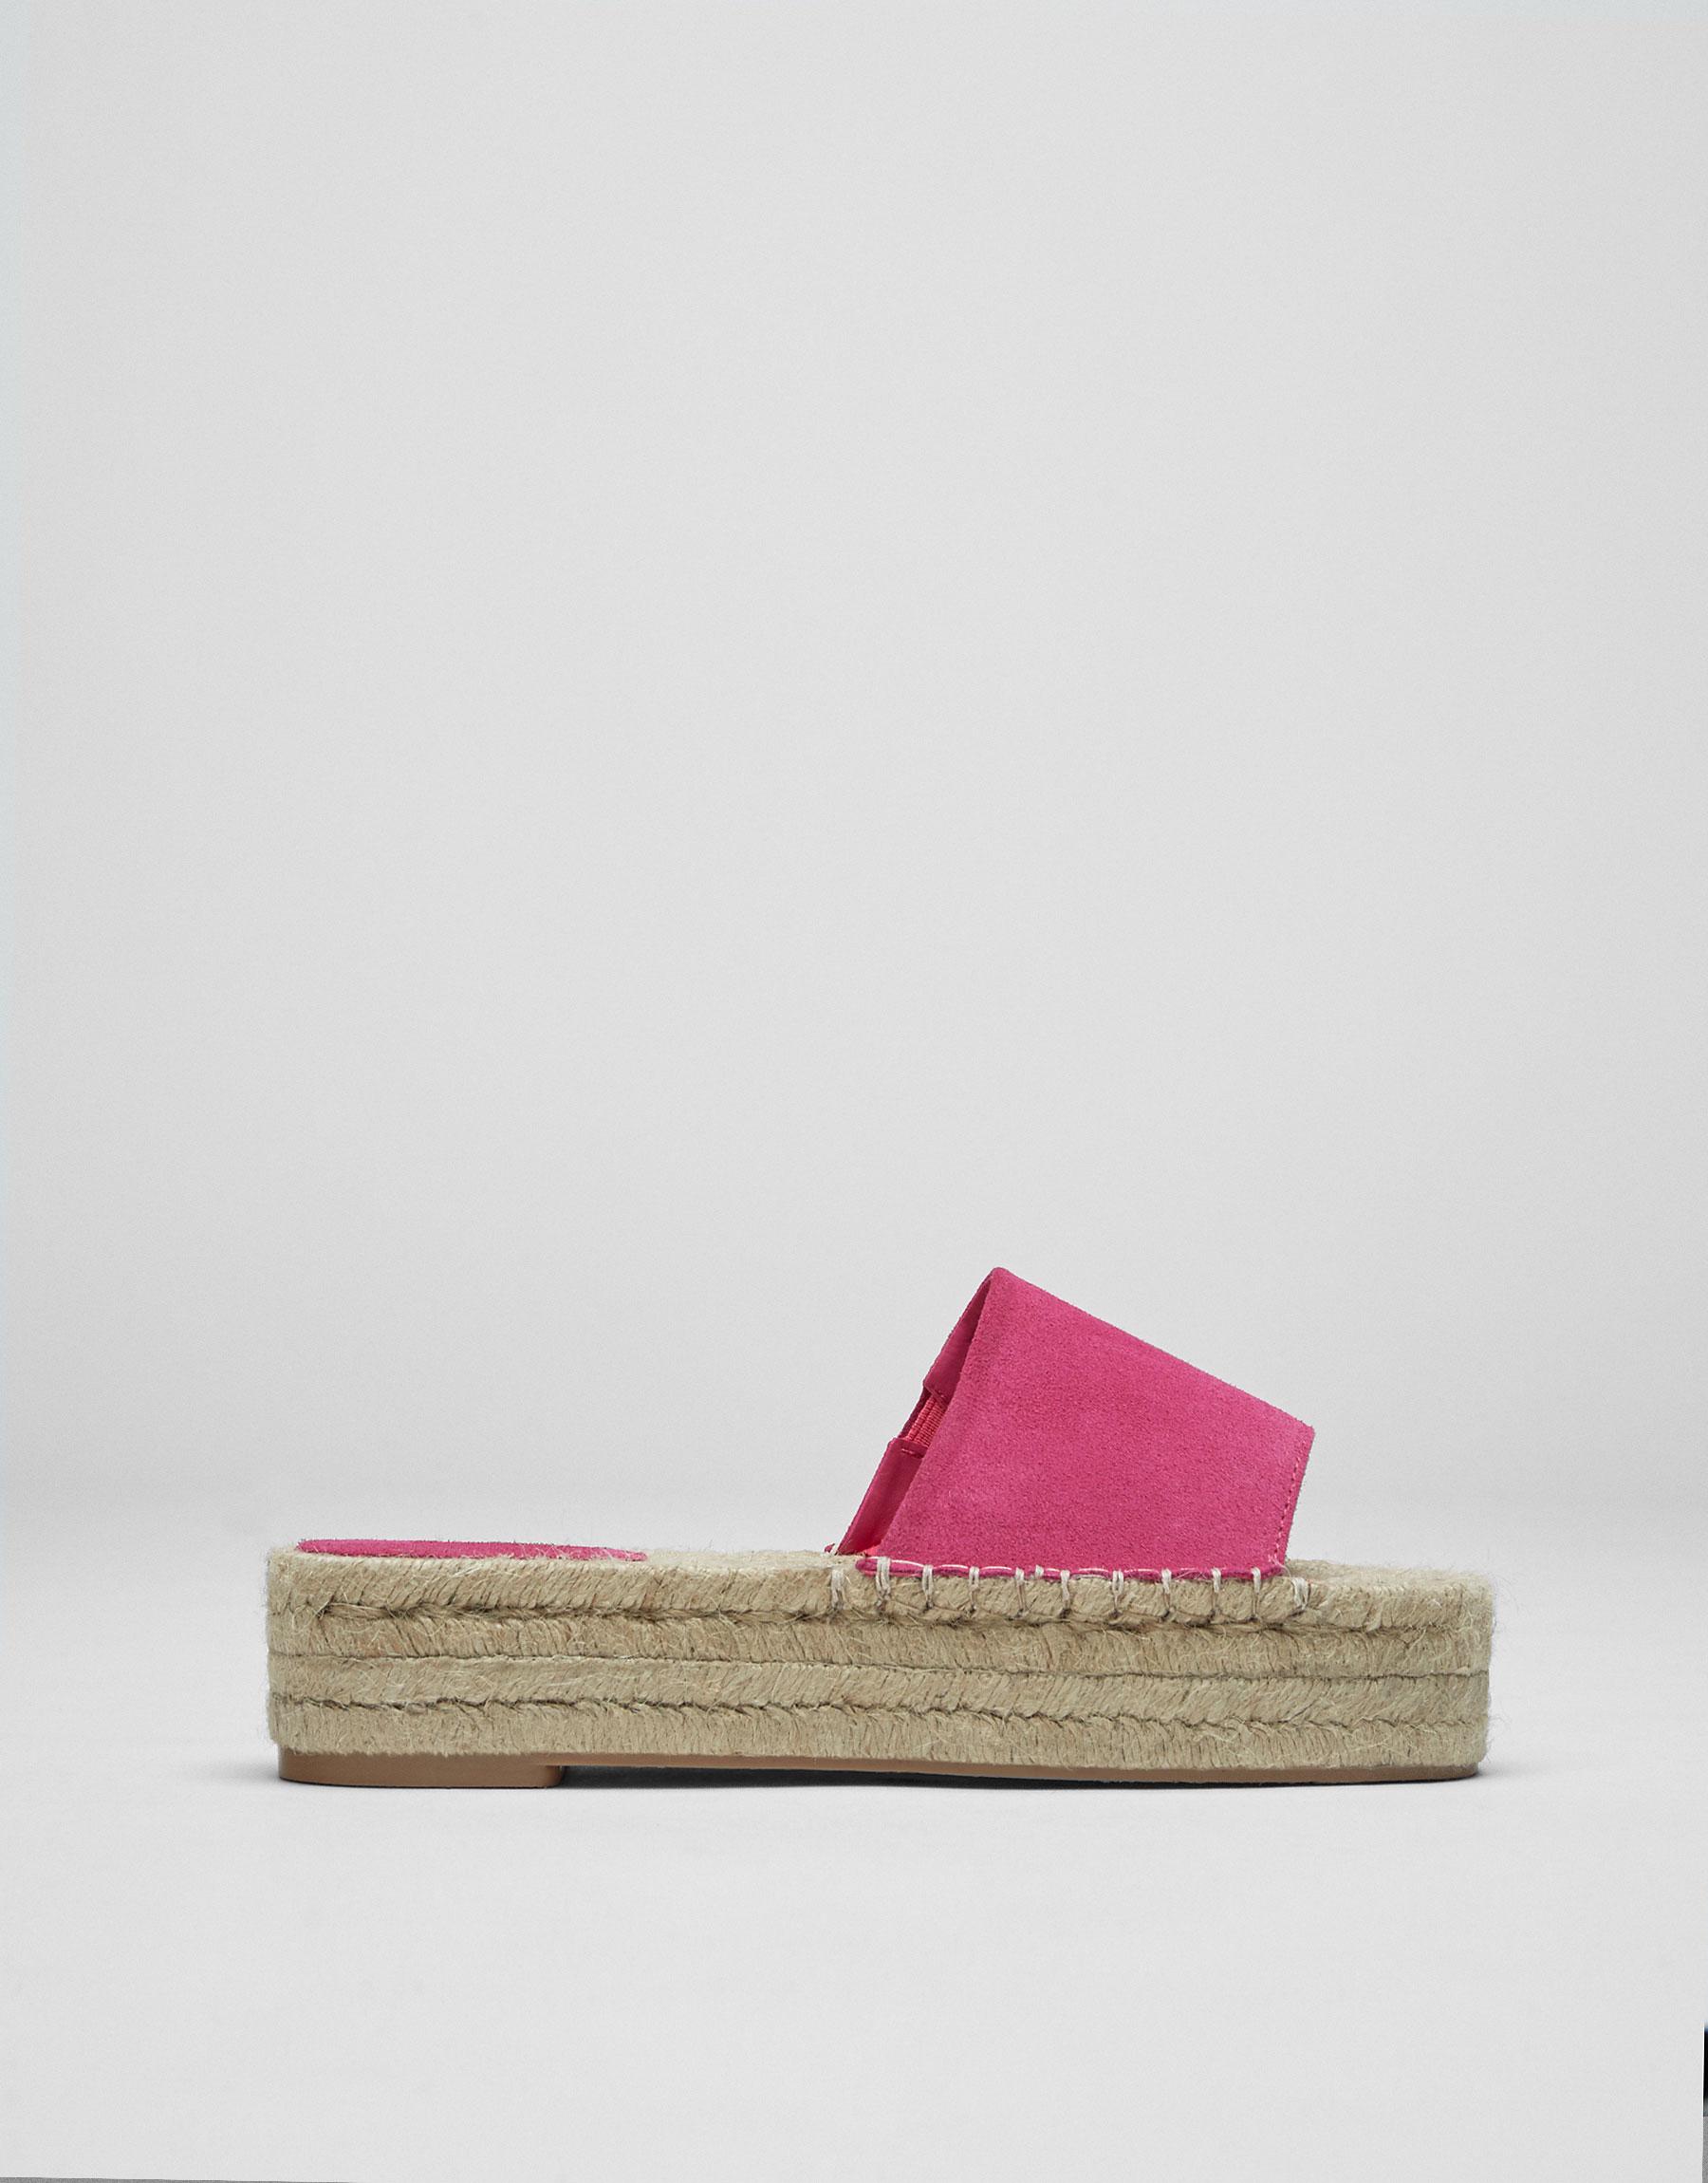 Coloured jute sandals